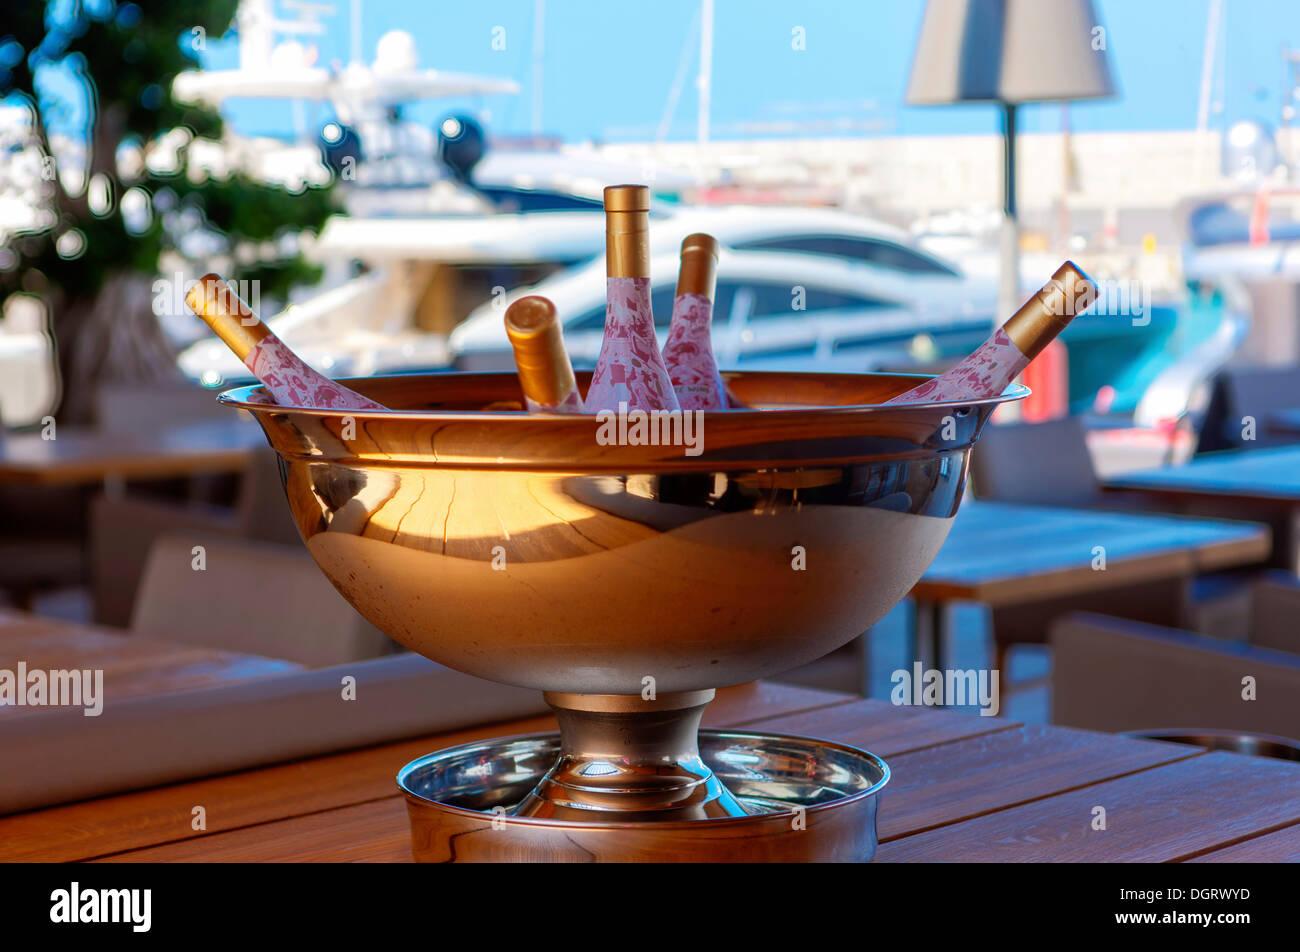 Champagne cooler in the marina of Port Adriano, El Toro, Mallorca, Majorca, Balearic Islands, Spain, Europe - Stock Image